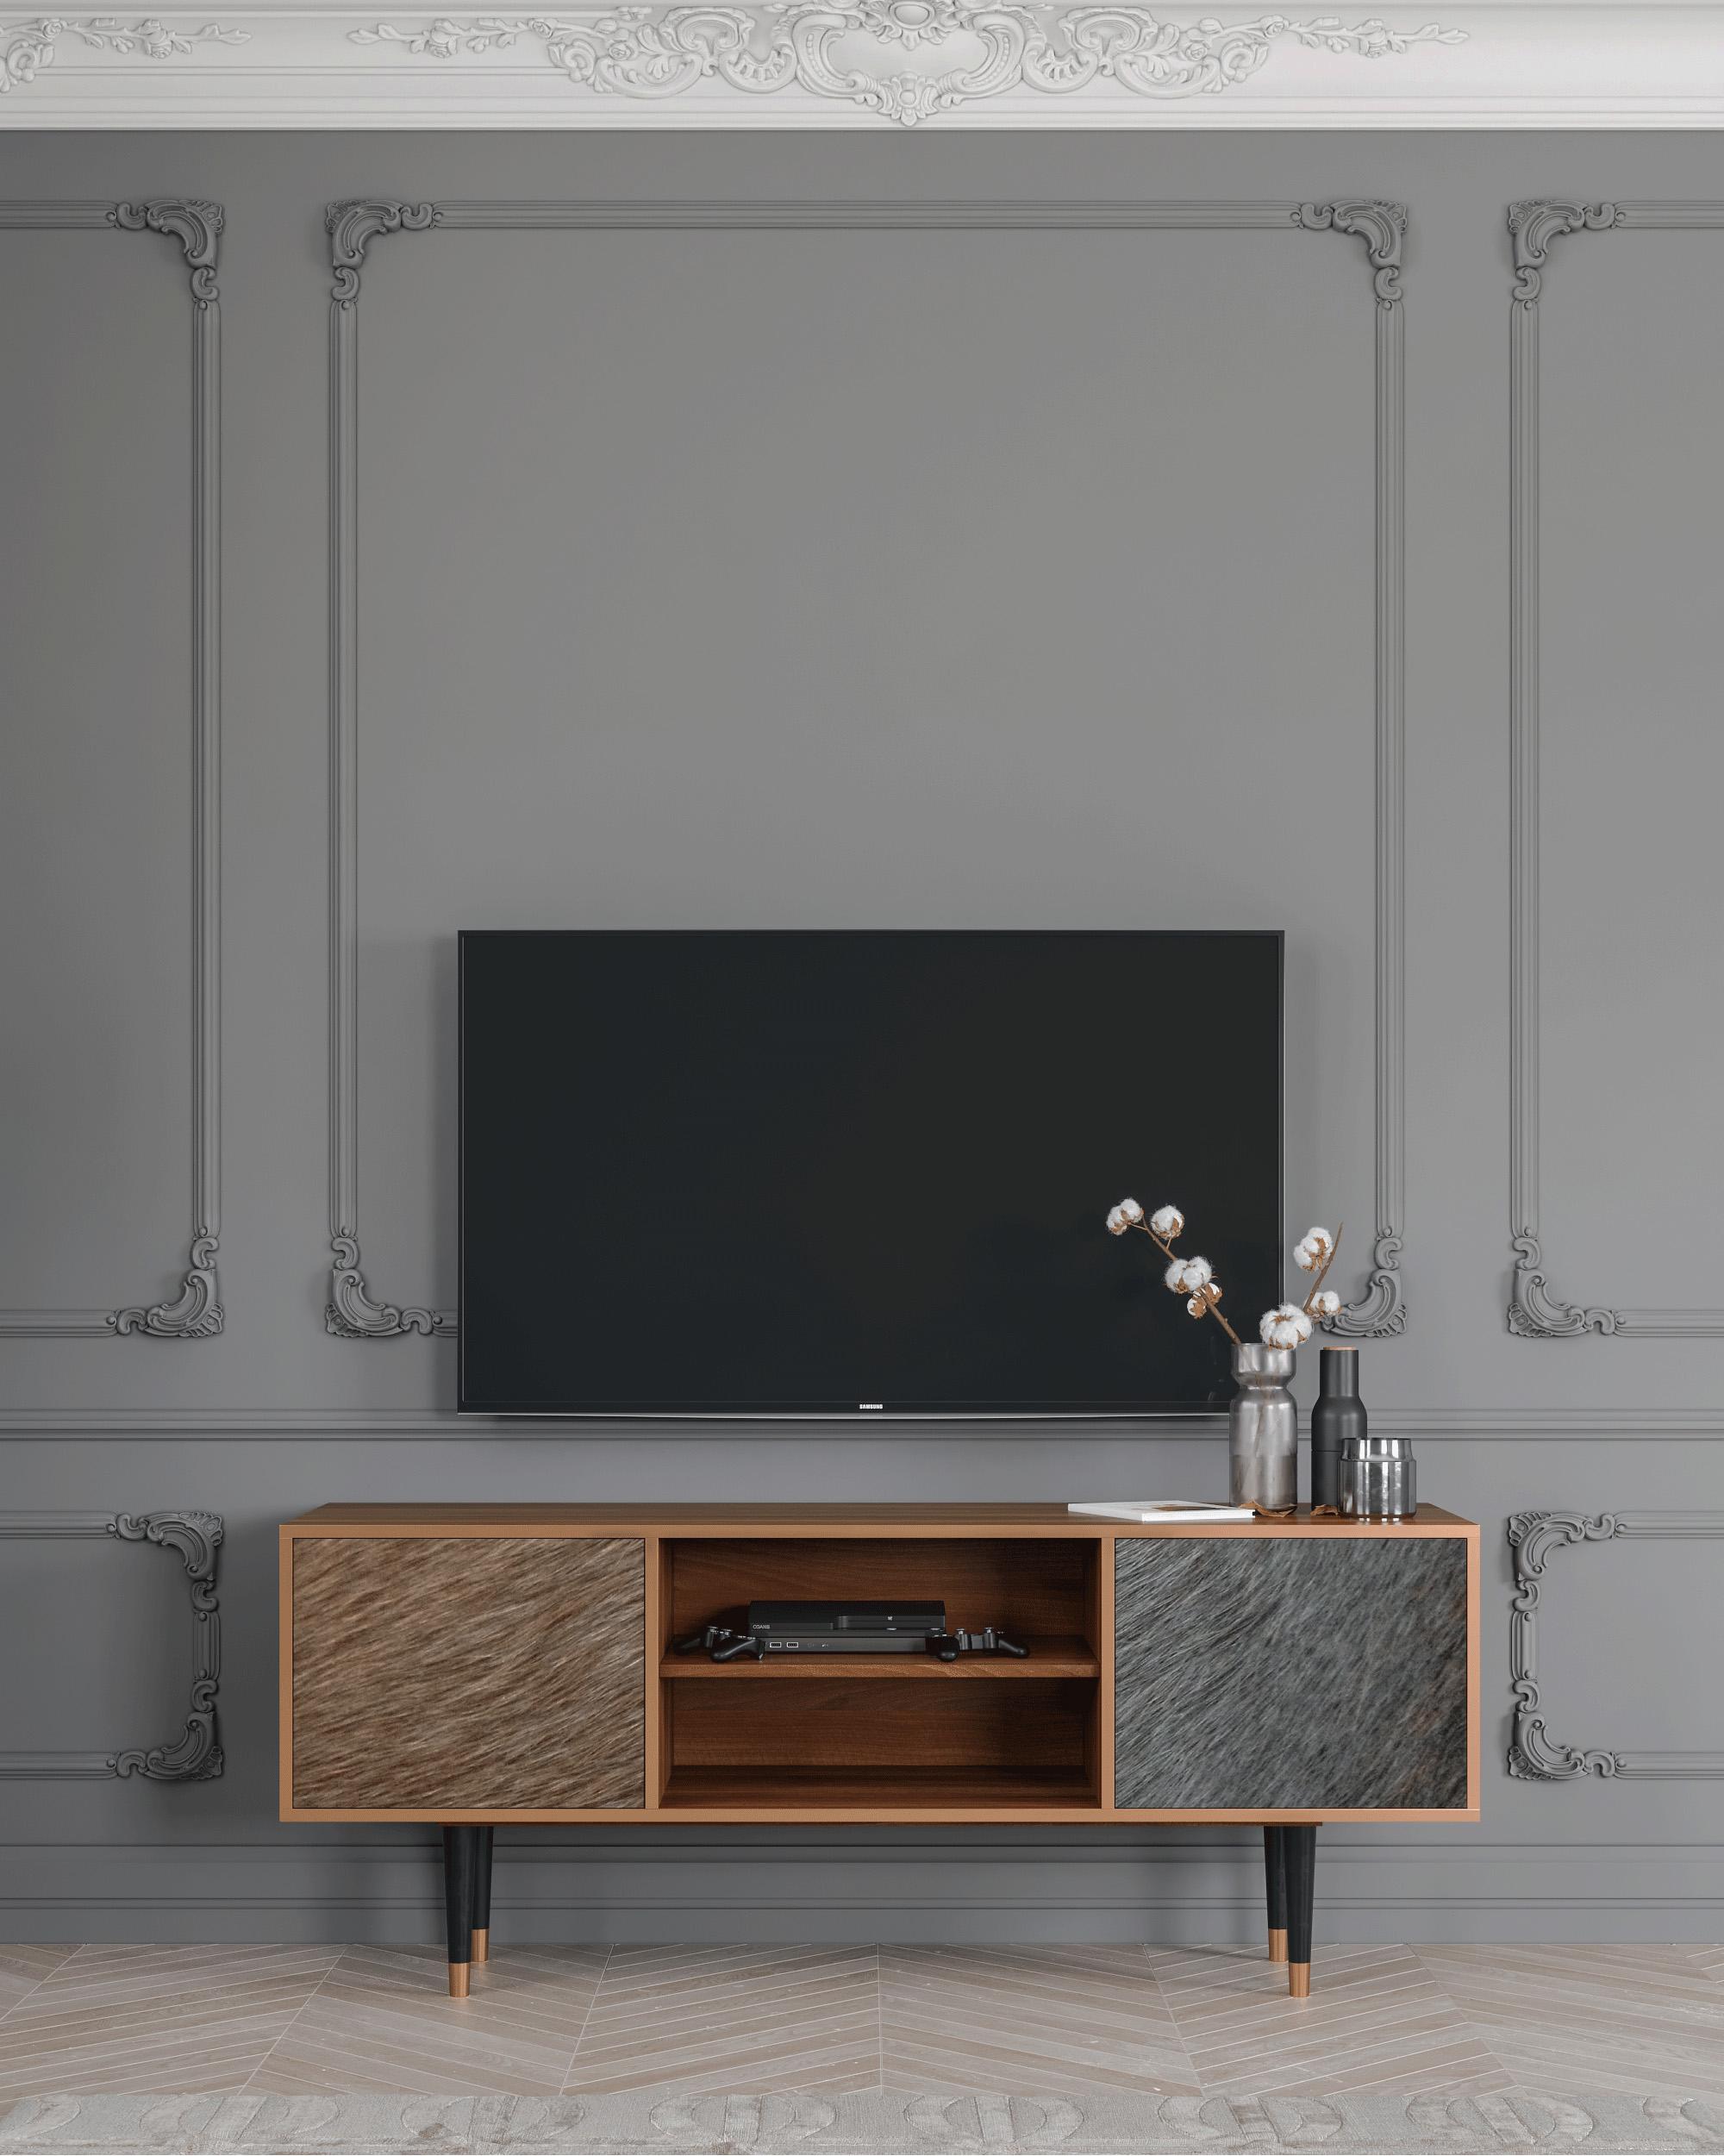 Meuble TV marron 170cm 2 portes